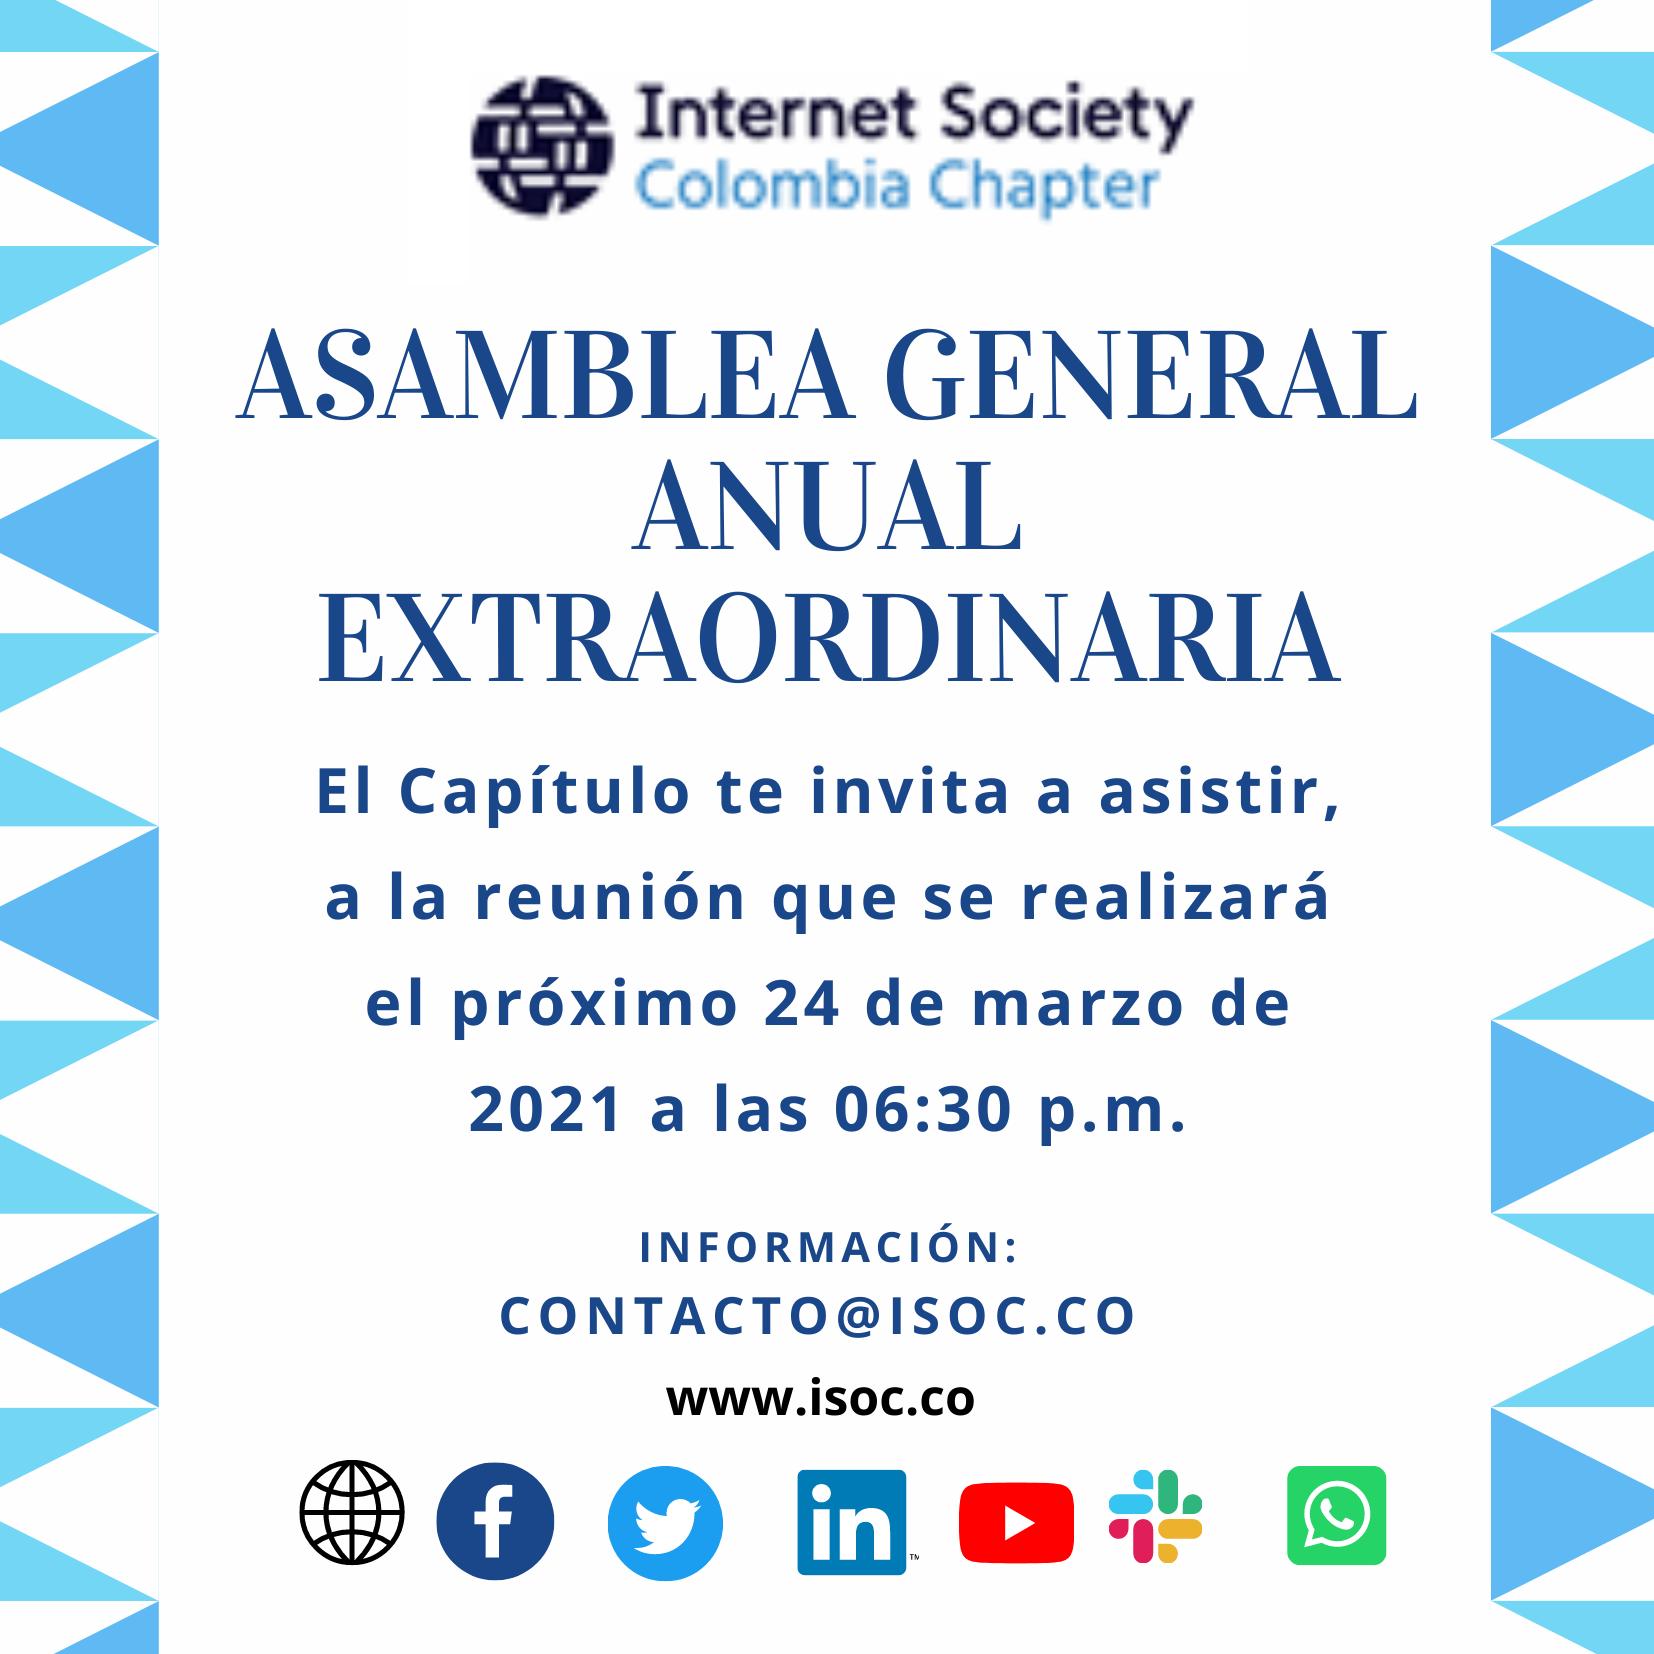 Imagen alusiva a Asamblea General Extraordinaria (2021) de Internet Society Colombia Chapter.